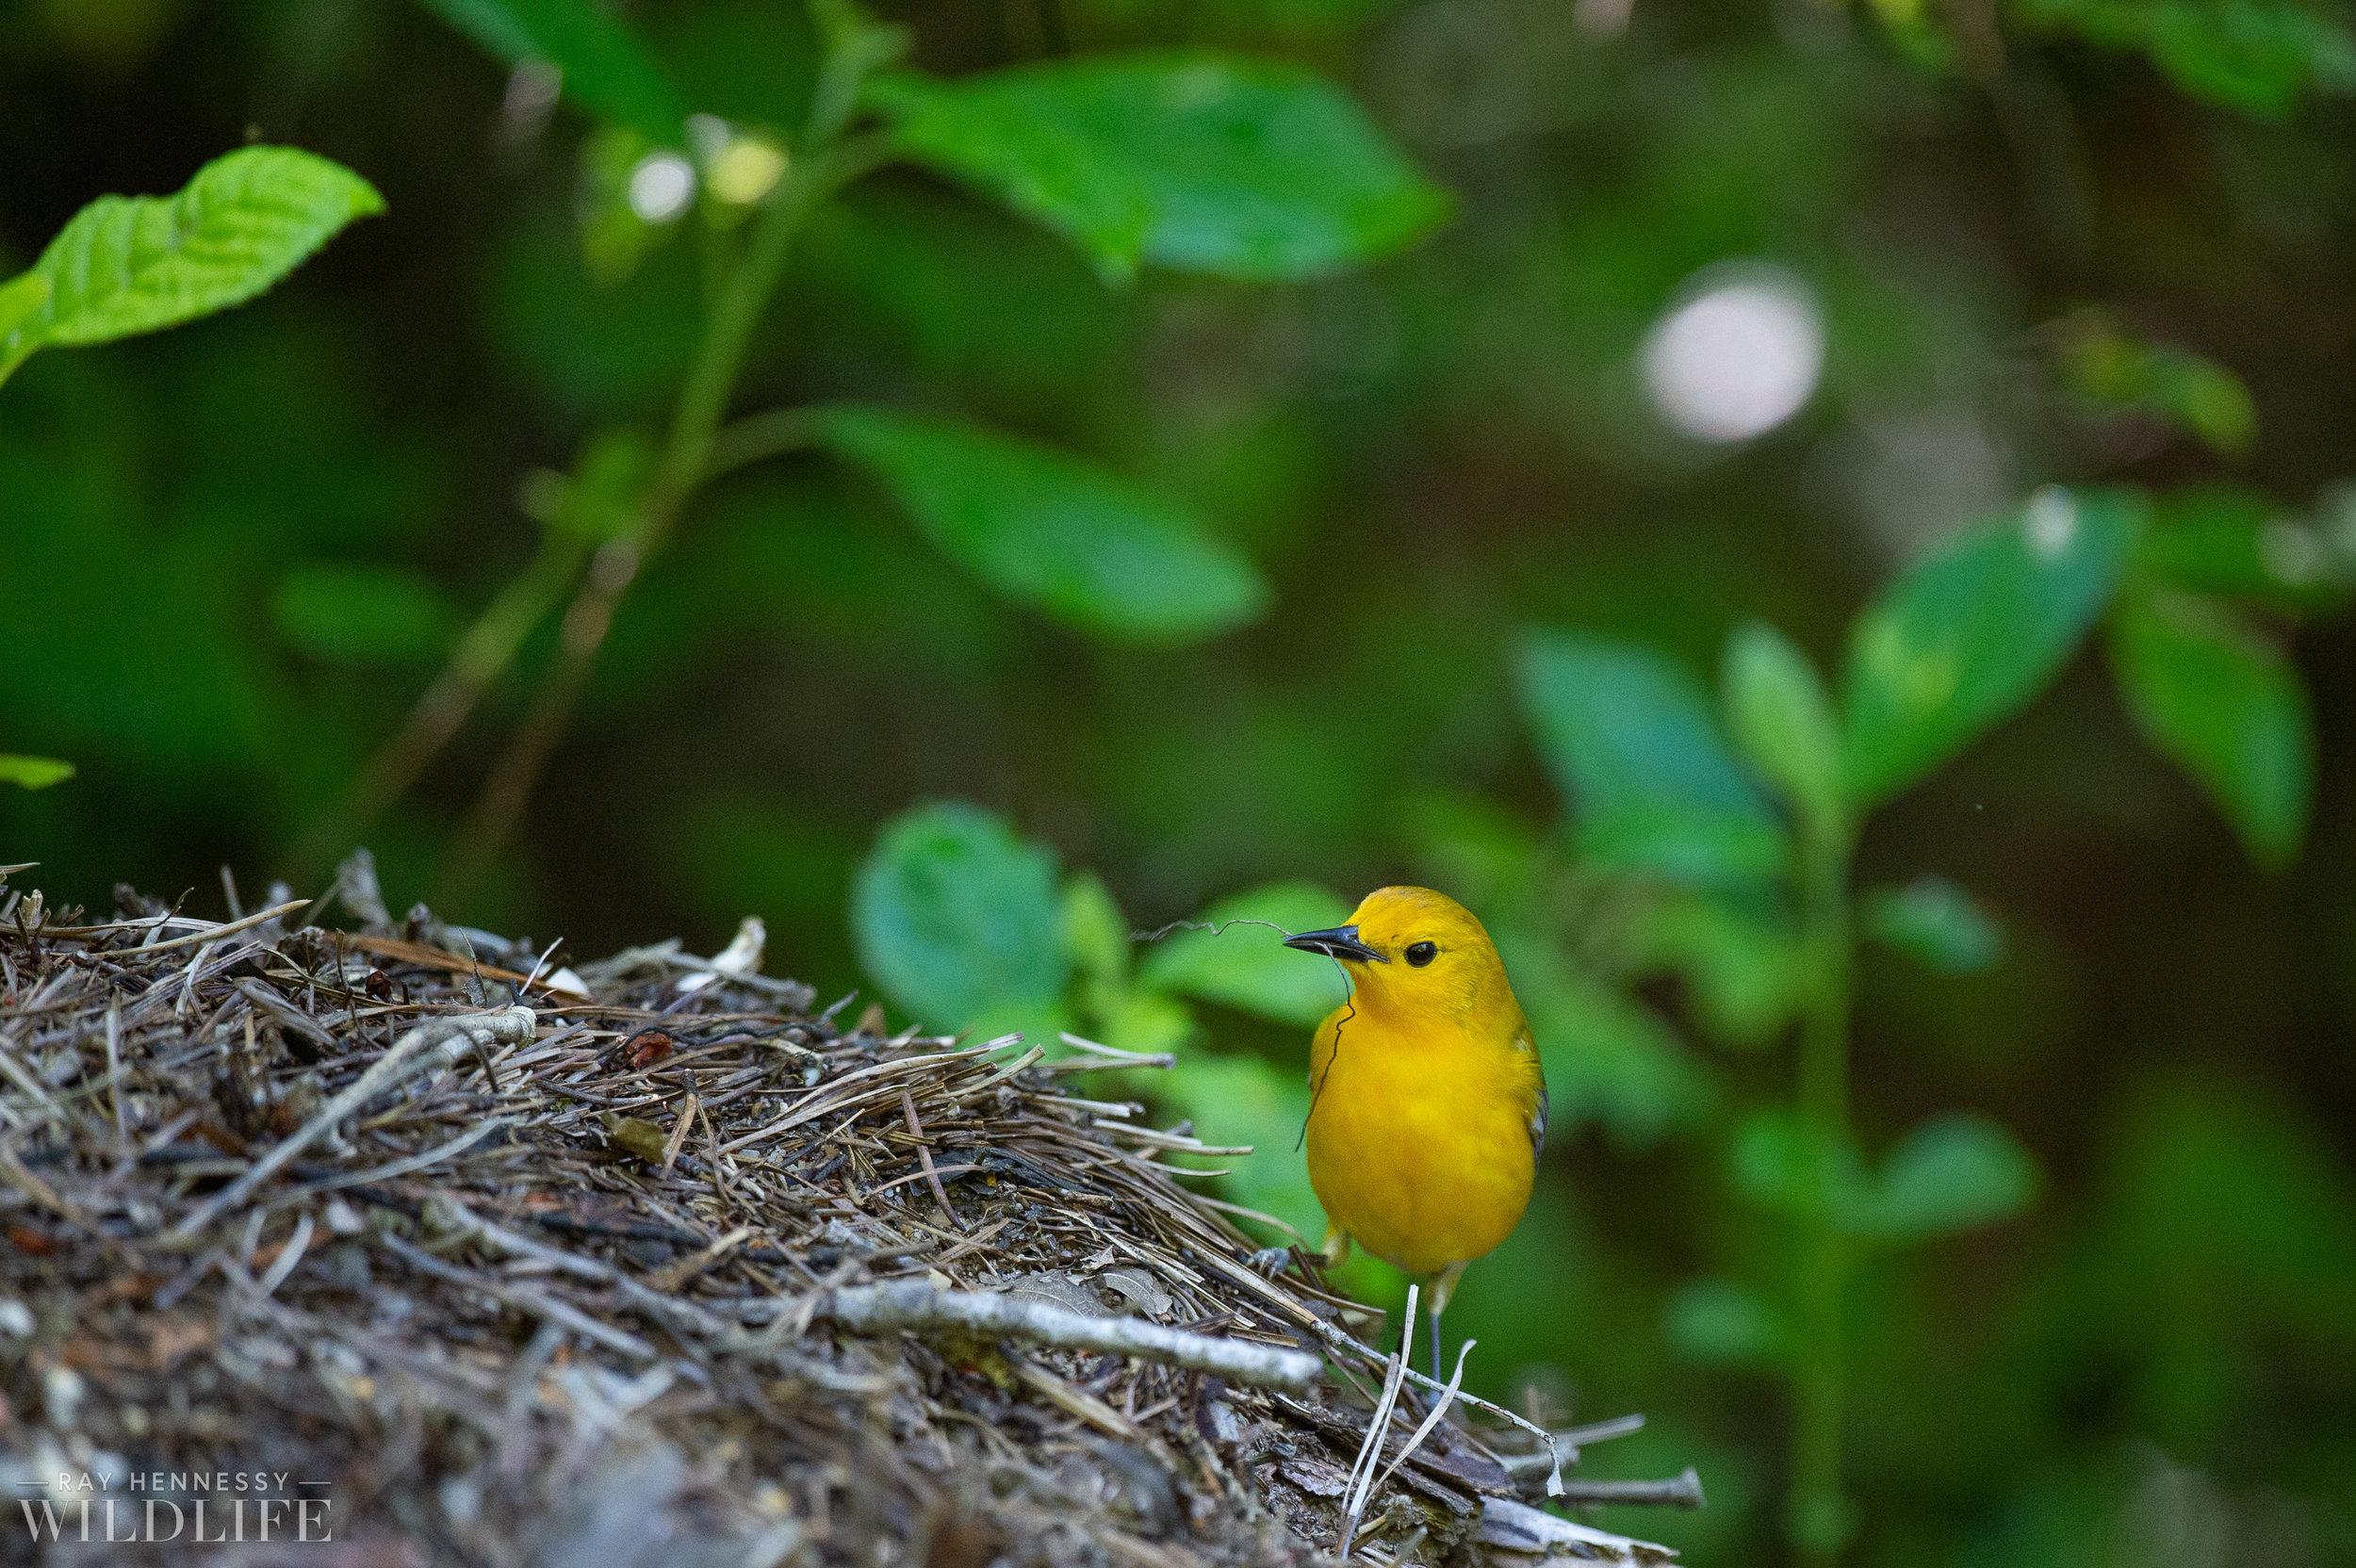 021_shorebirds-prothonotary-warbler.jpg